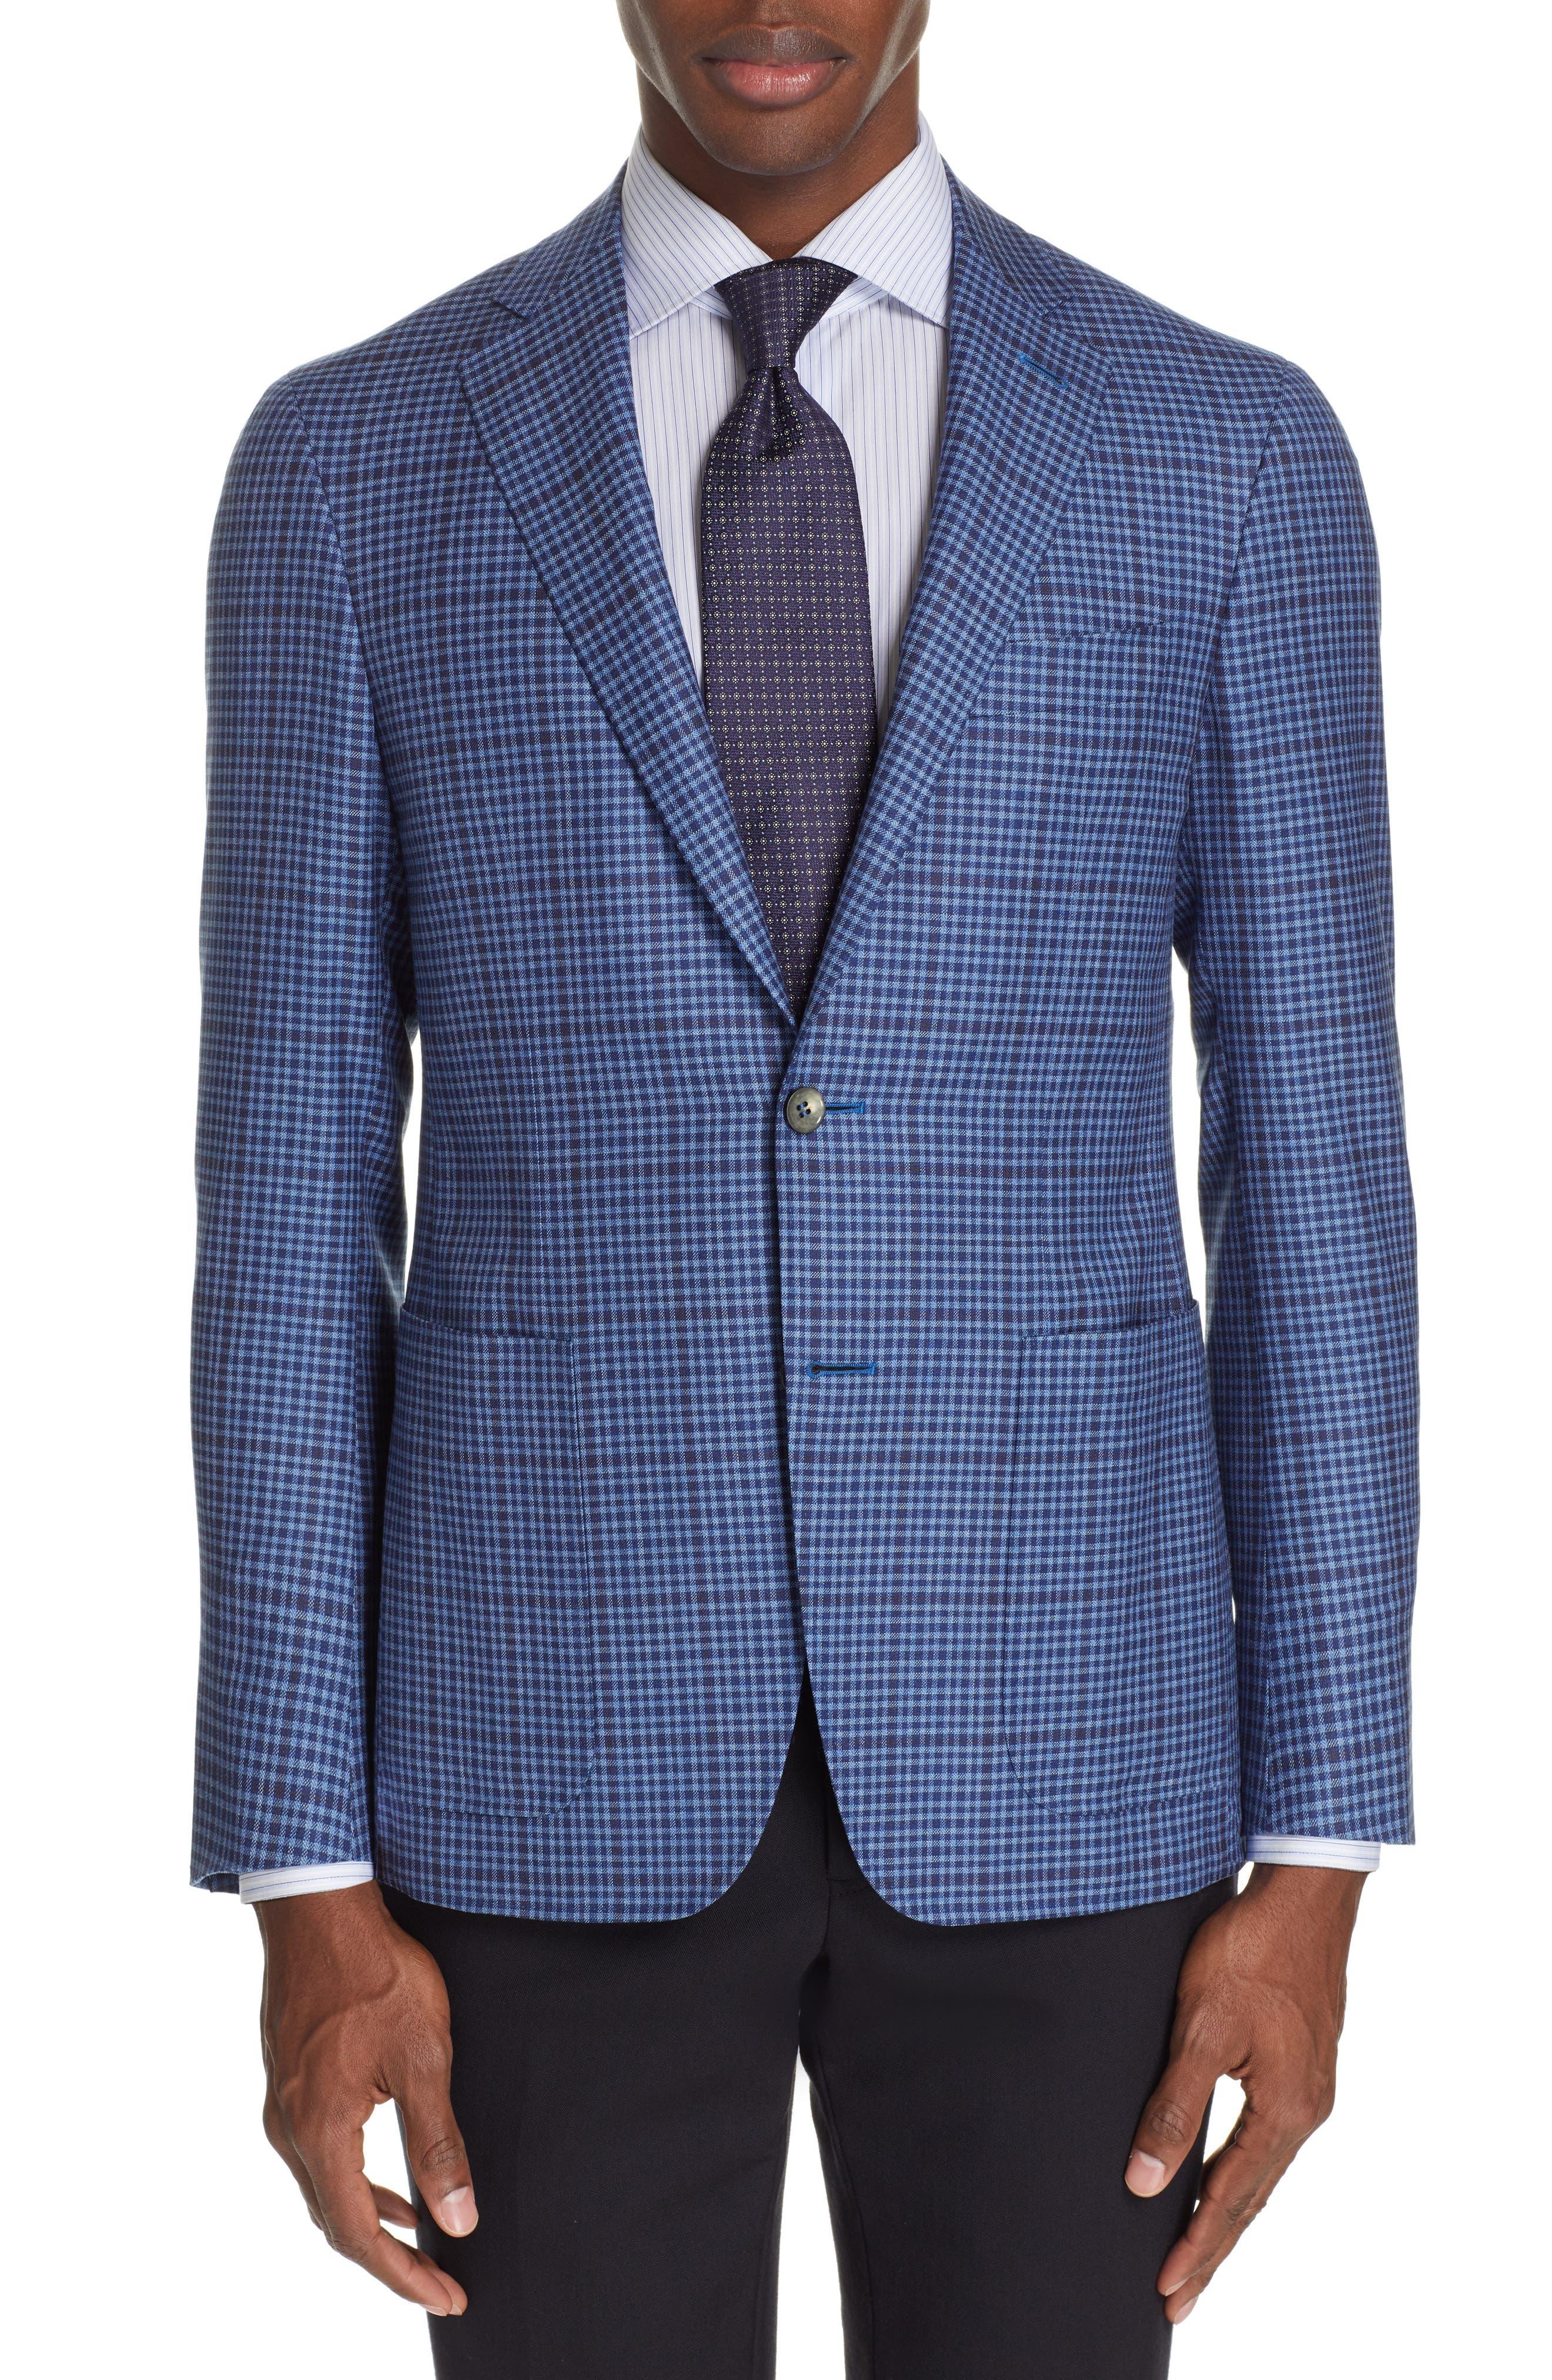 CANALI, Kei Classic Fit Check Wool Sport Coat, Main thumbnail 1, color, BLUE